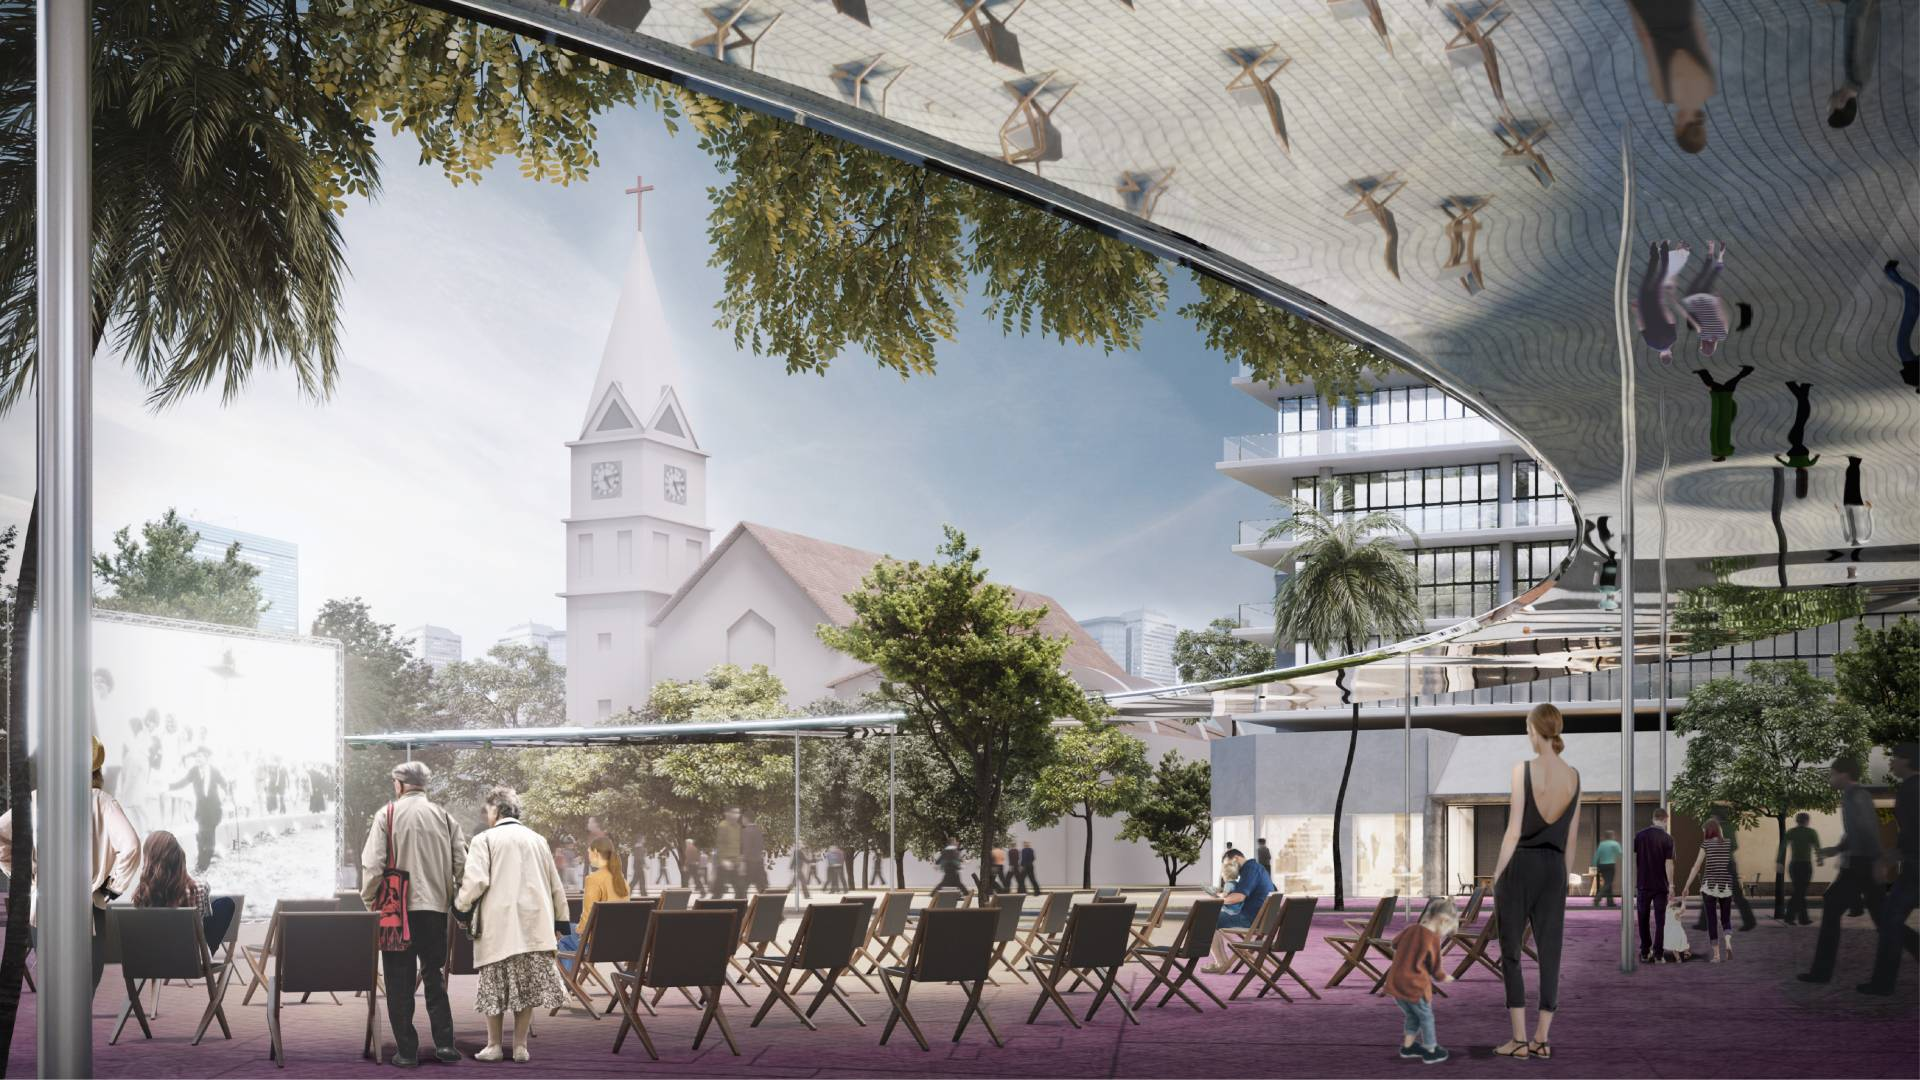 LARGO DA BATATA - Batata Master Plan - SPOL Architects